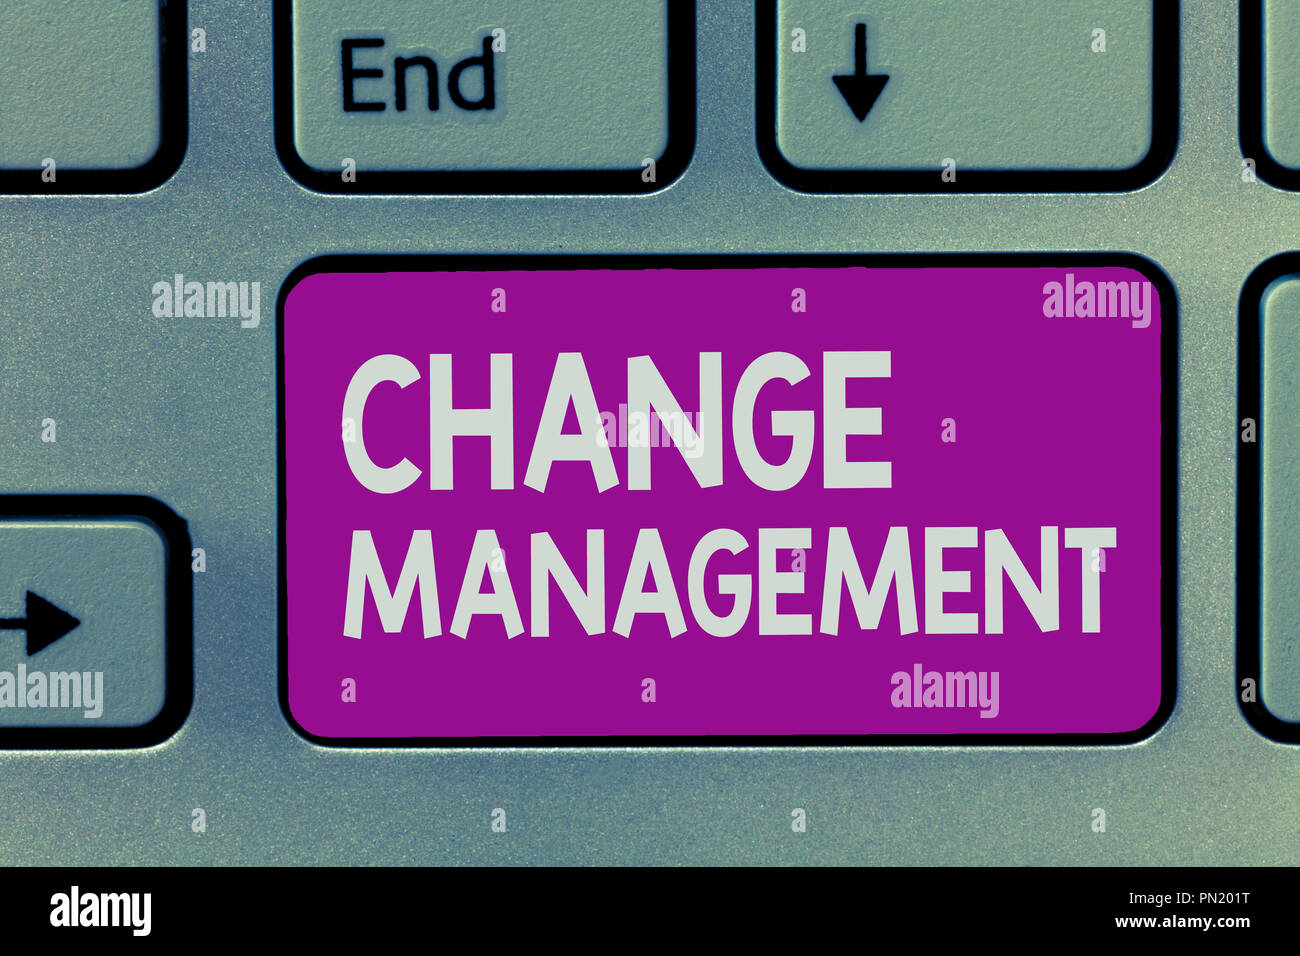 Change Management Stock Photos Amp Change Management Stock Images